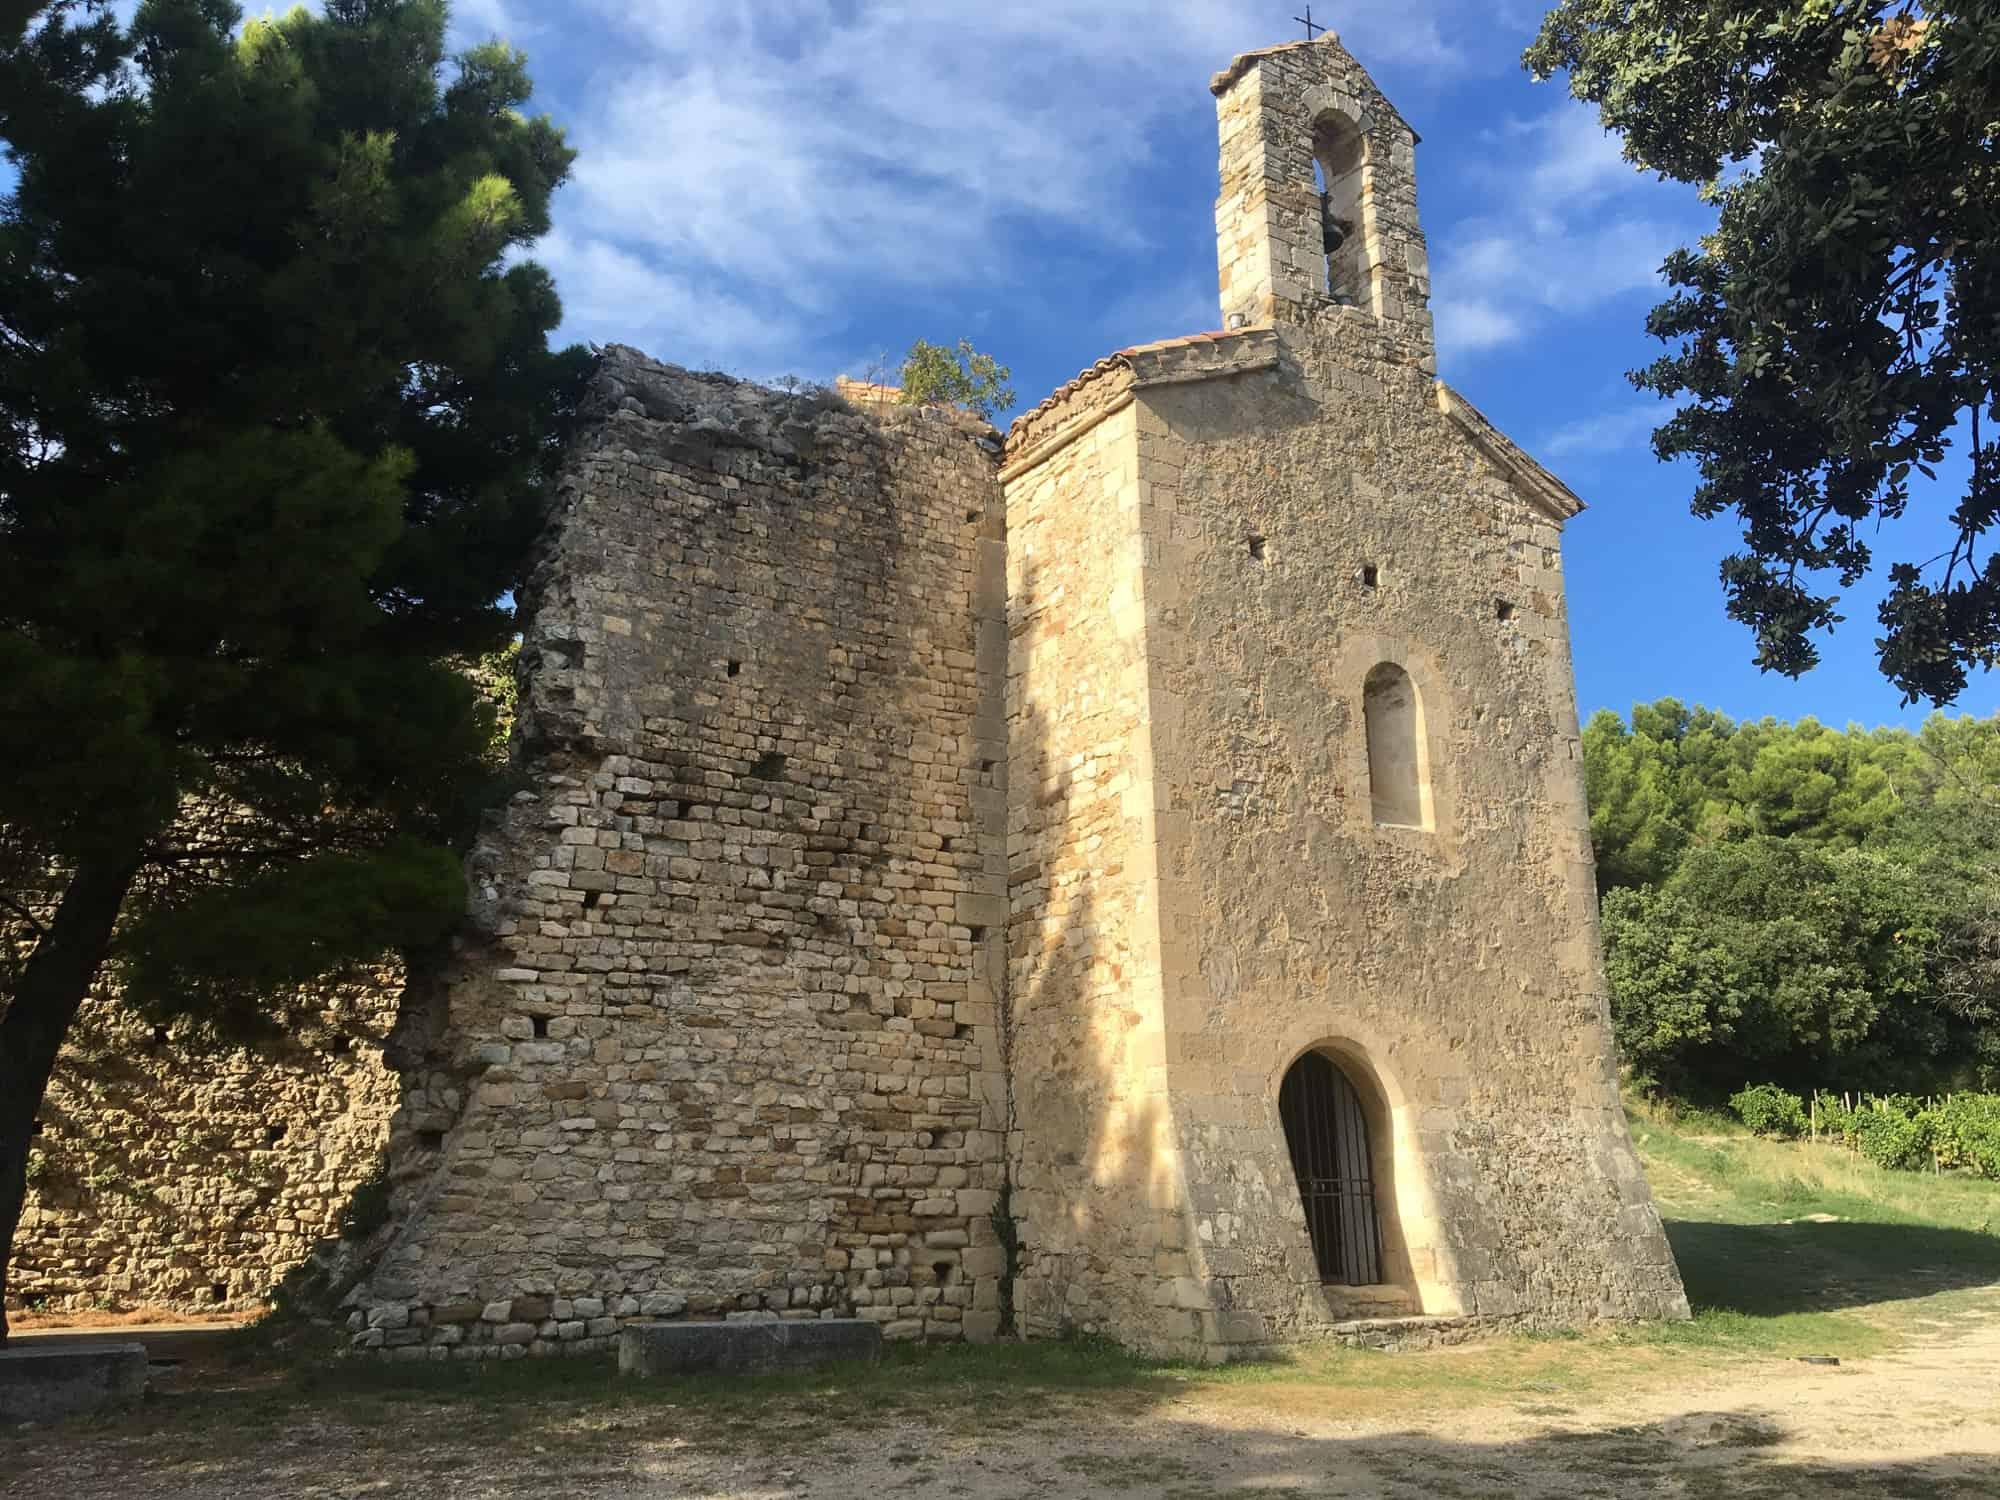 Chateau St. Cosme